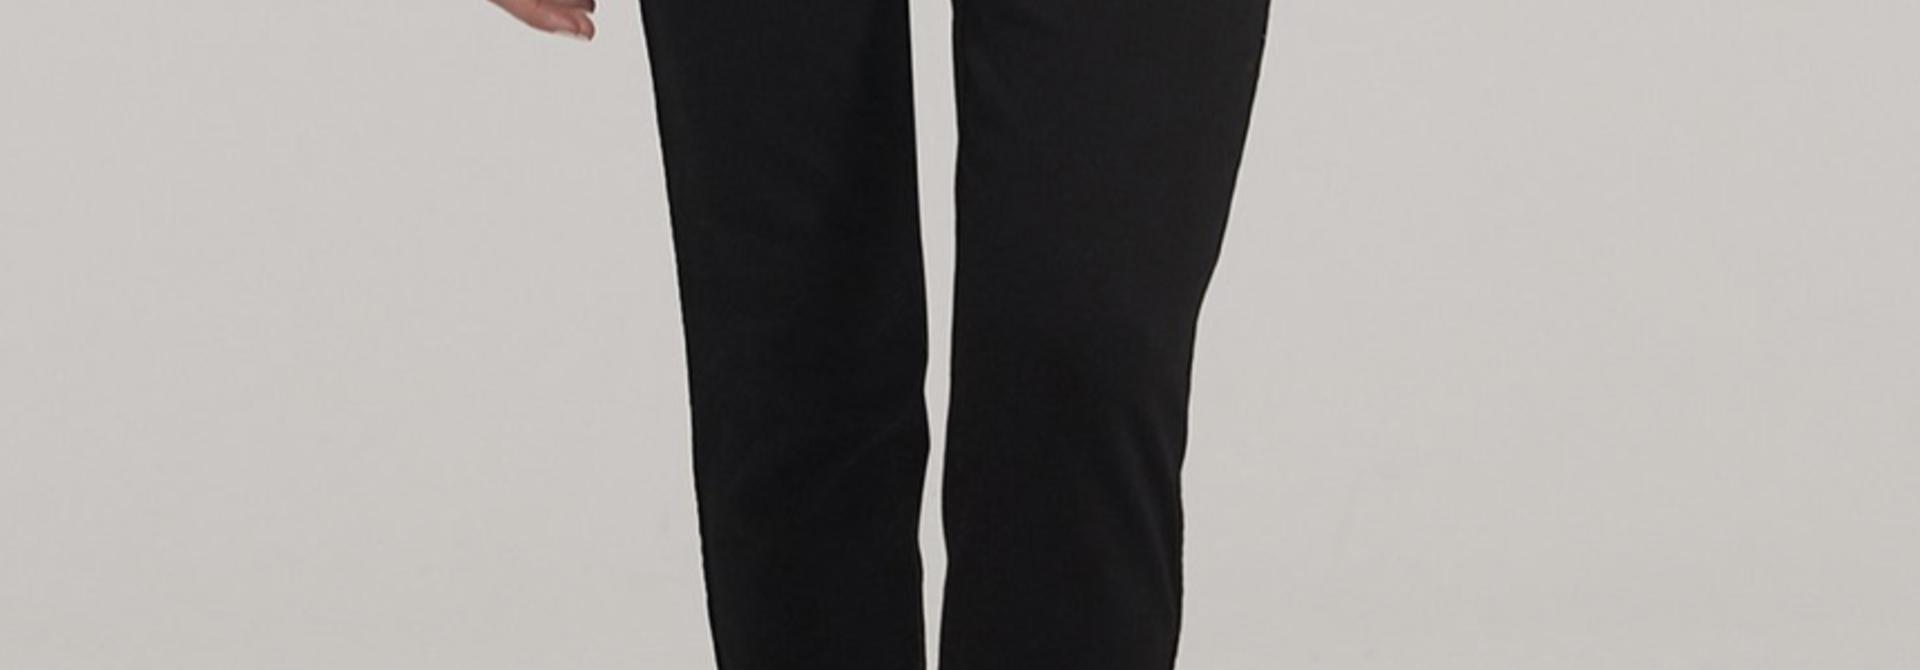 Malia Relaxed Slim Pant Balance